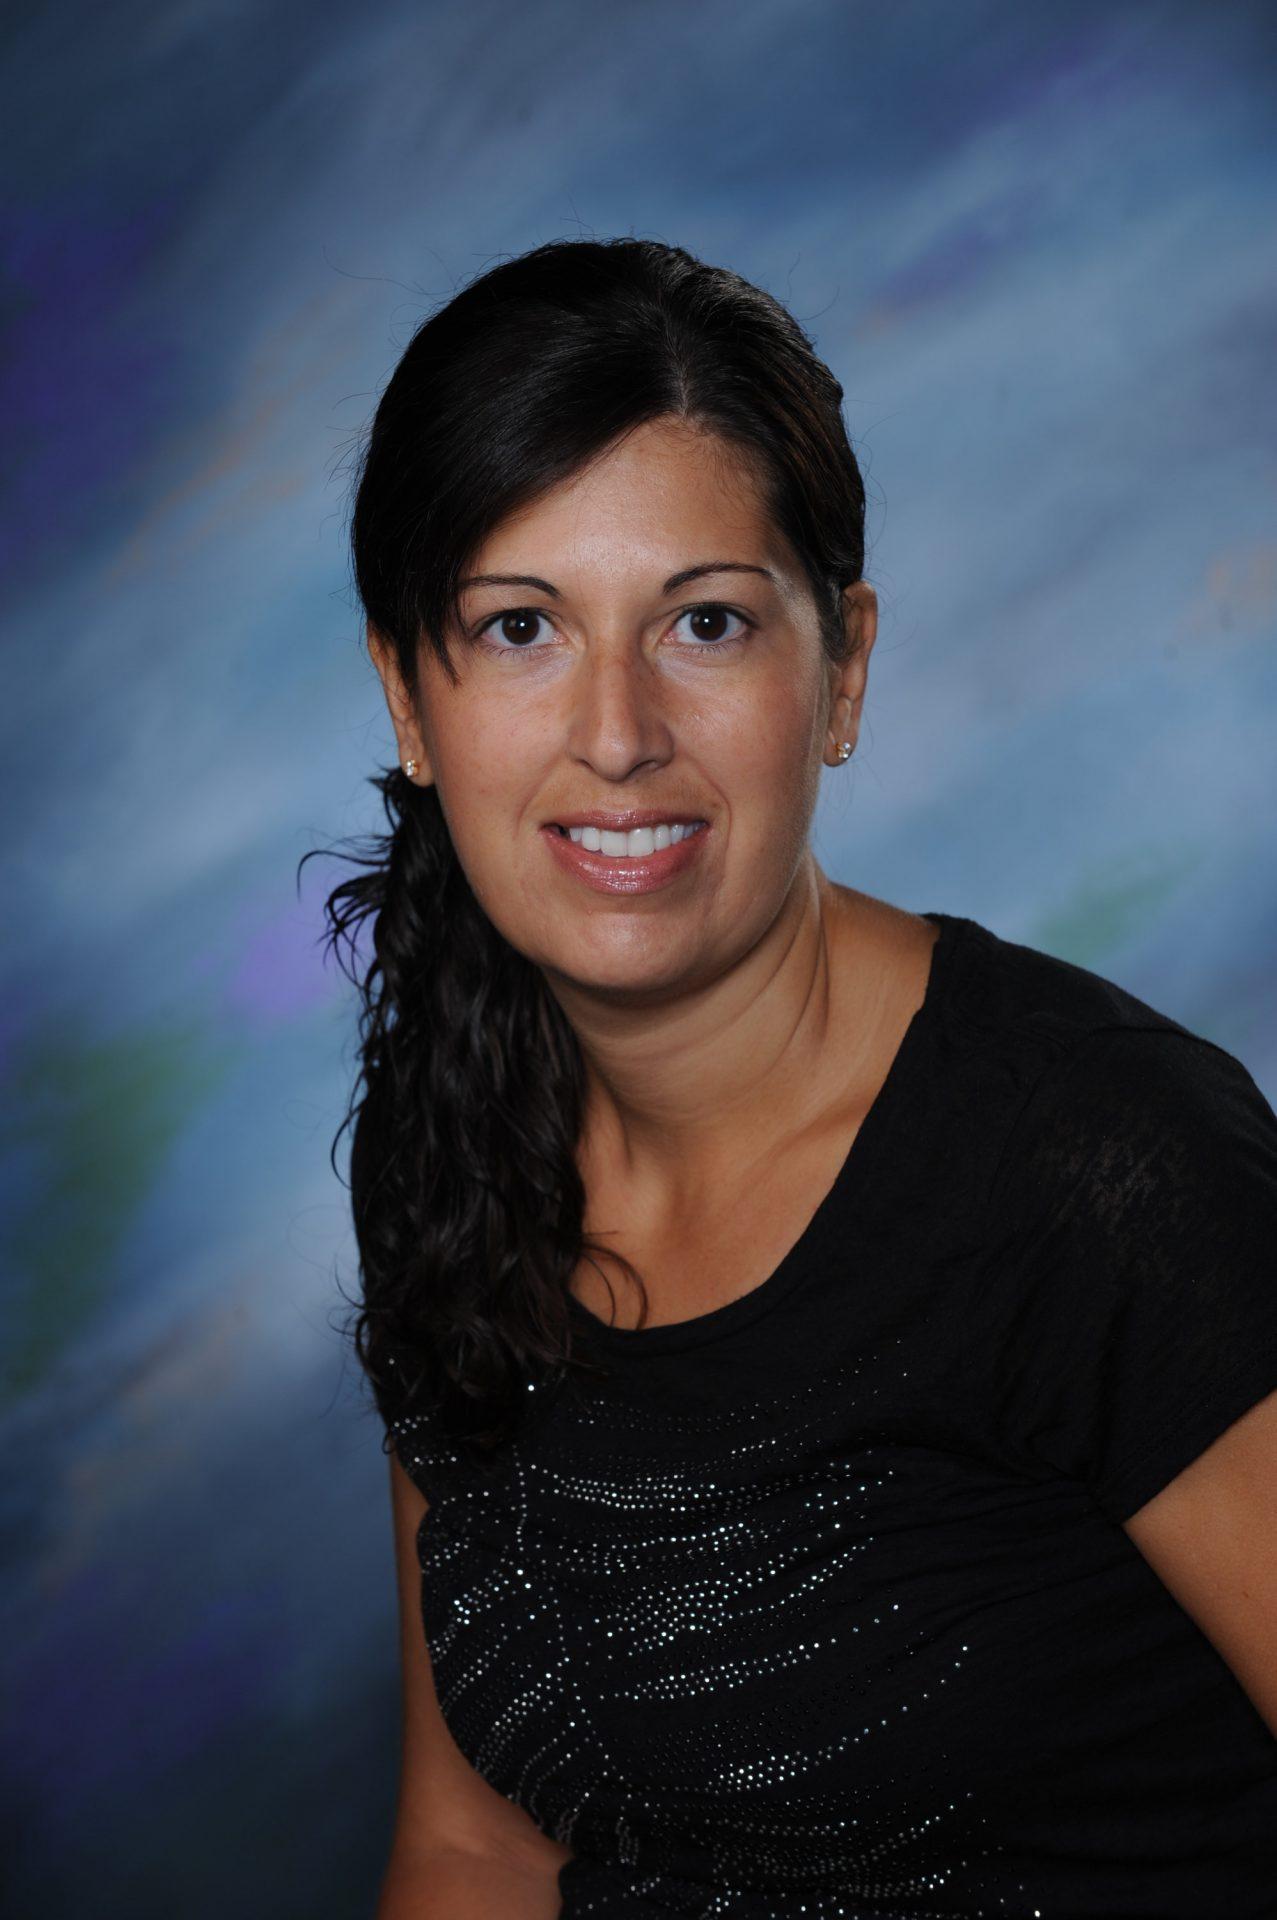 Yearbook photo of Jen Carreiro